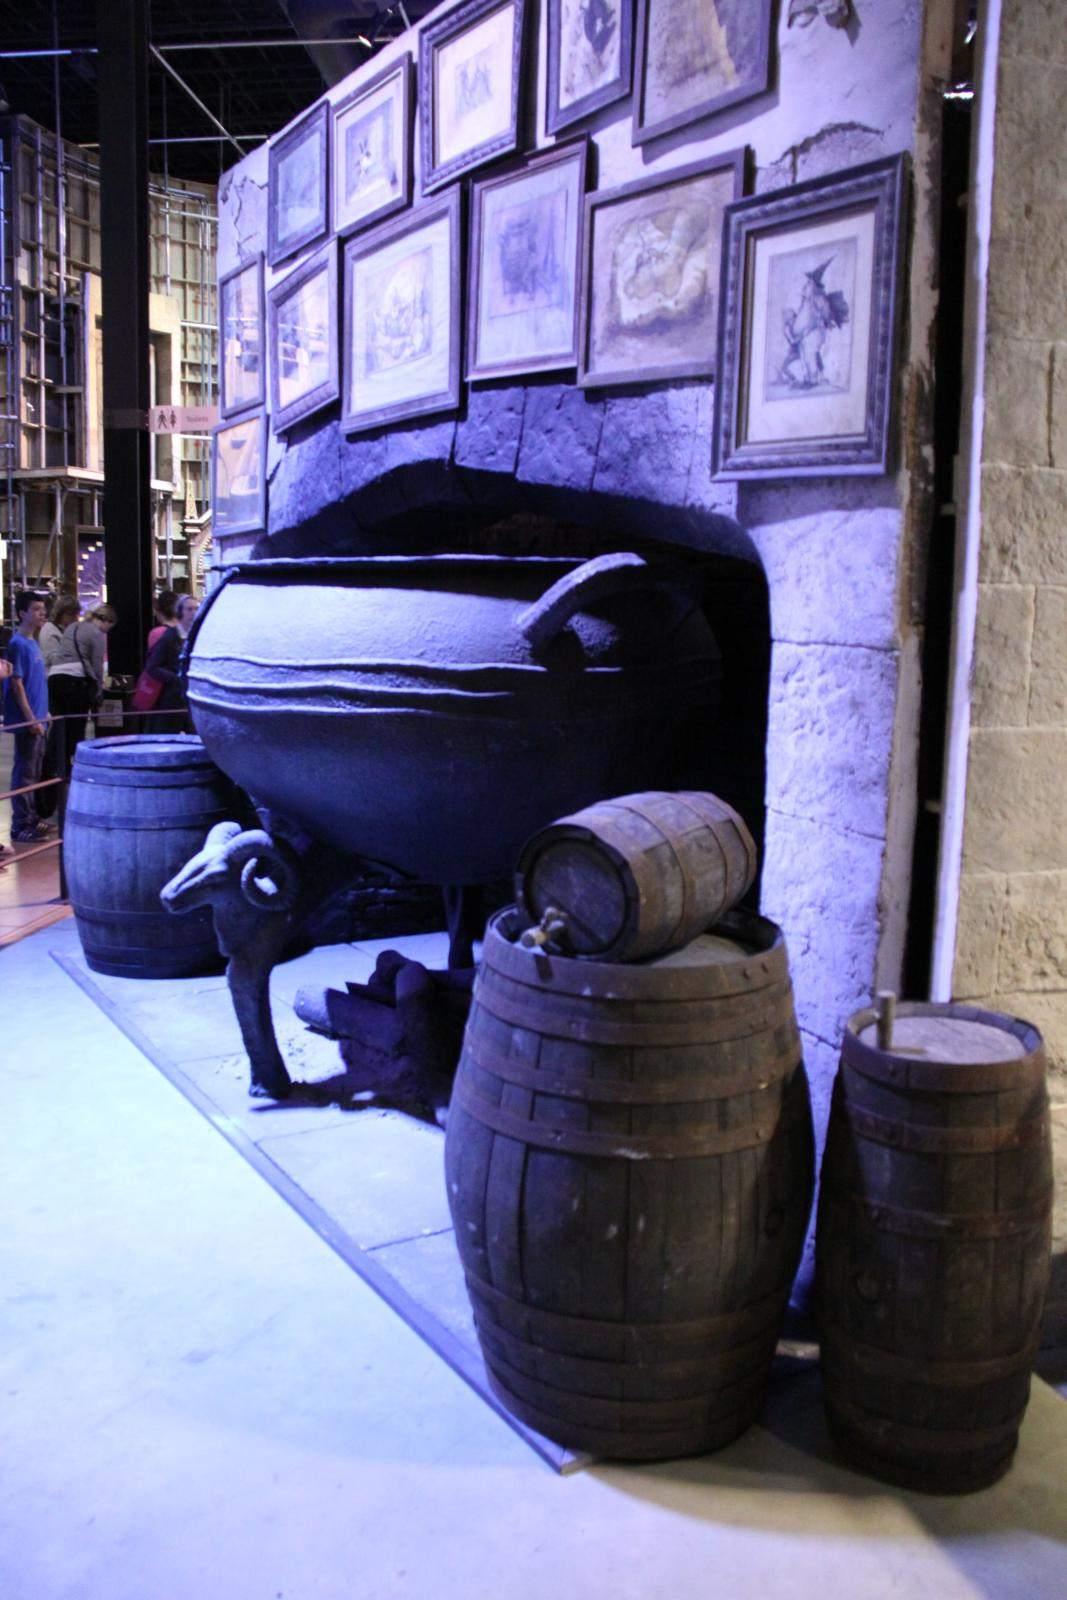 making harry potter12 The Making of Harry Potter, Warner Bros Studio London